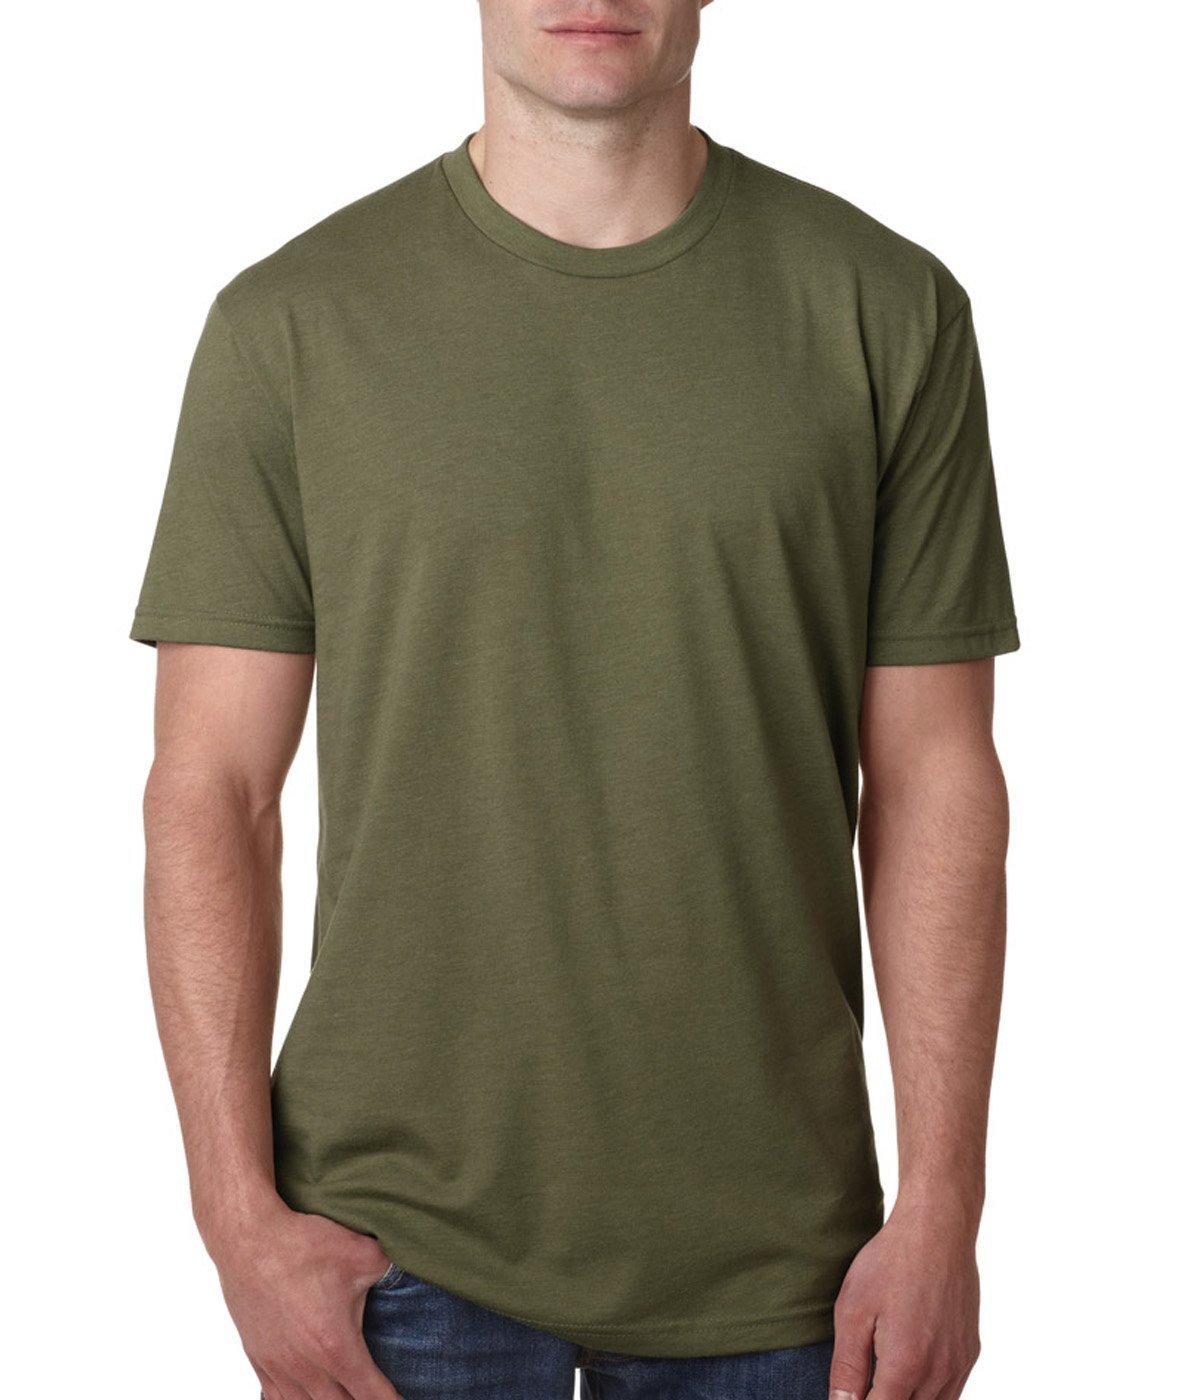 Next Level Apparel メンズ CVC クルーネック ジャージ Tシャツ B07D5JFNLC X-Large|Charcoal + Military Green (2 Shirts) Charcoal + Military Green (2 Shirts) X-Large